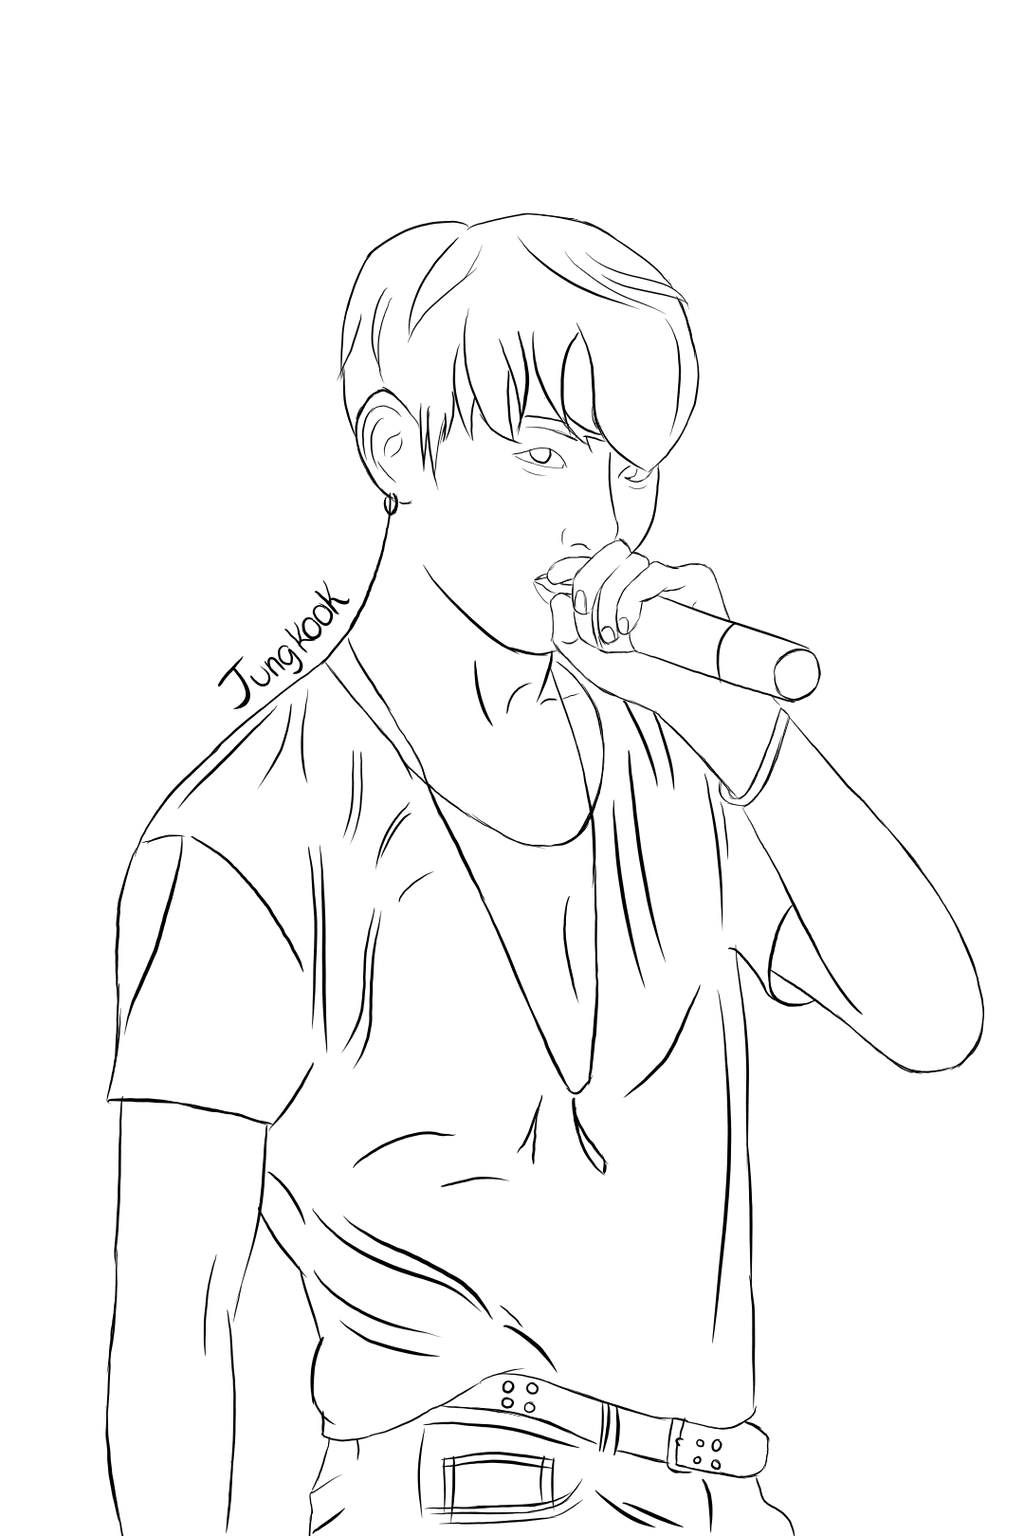 Line Drawing Tumblr Tutorial : Jungkook lineart by kidocat on deviantart